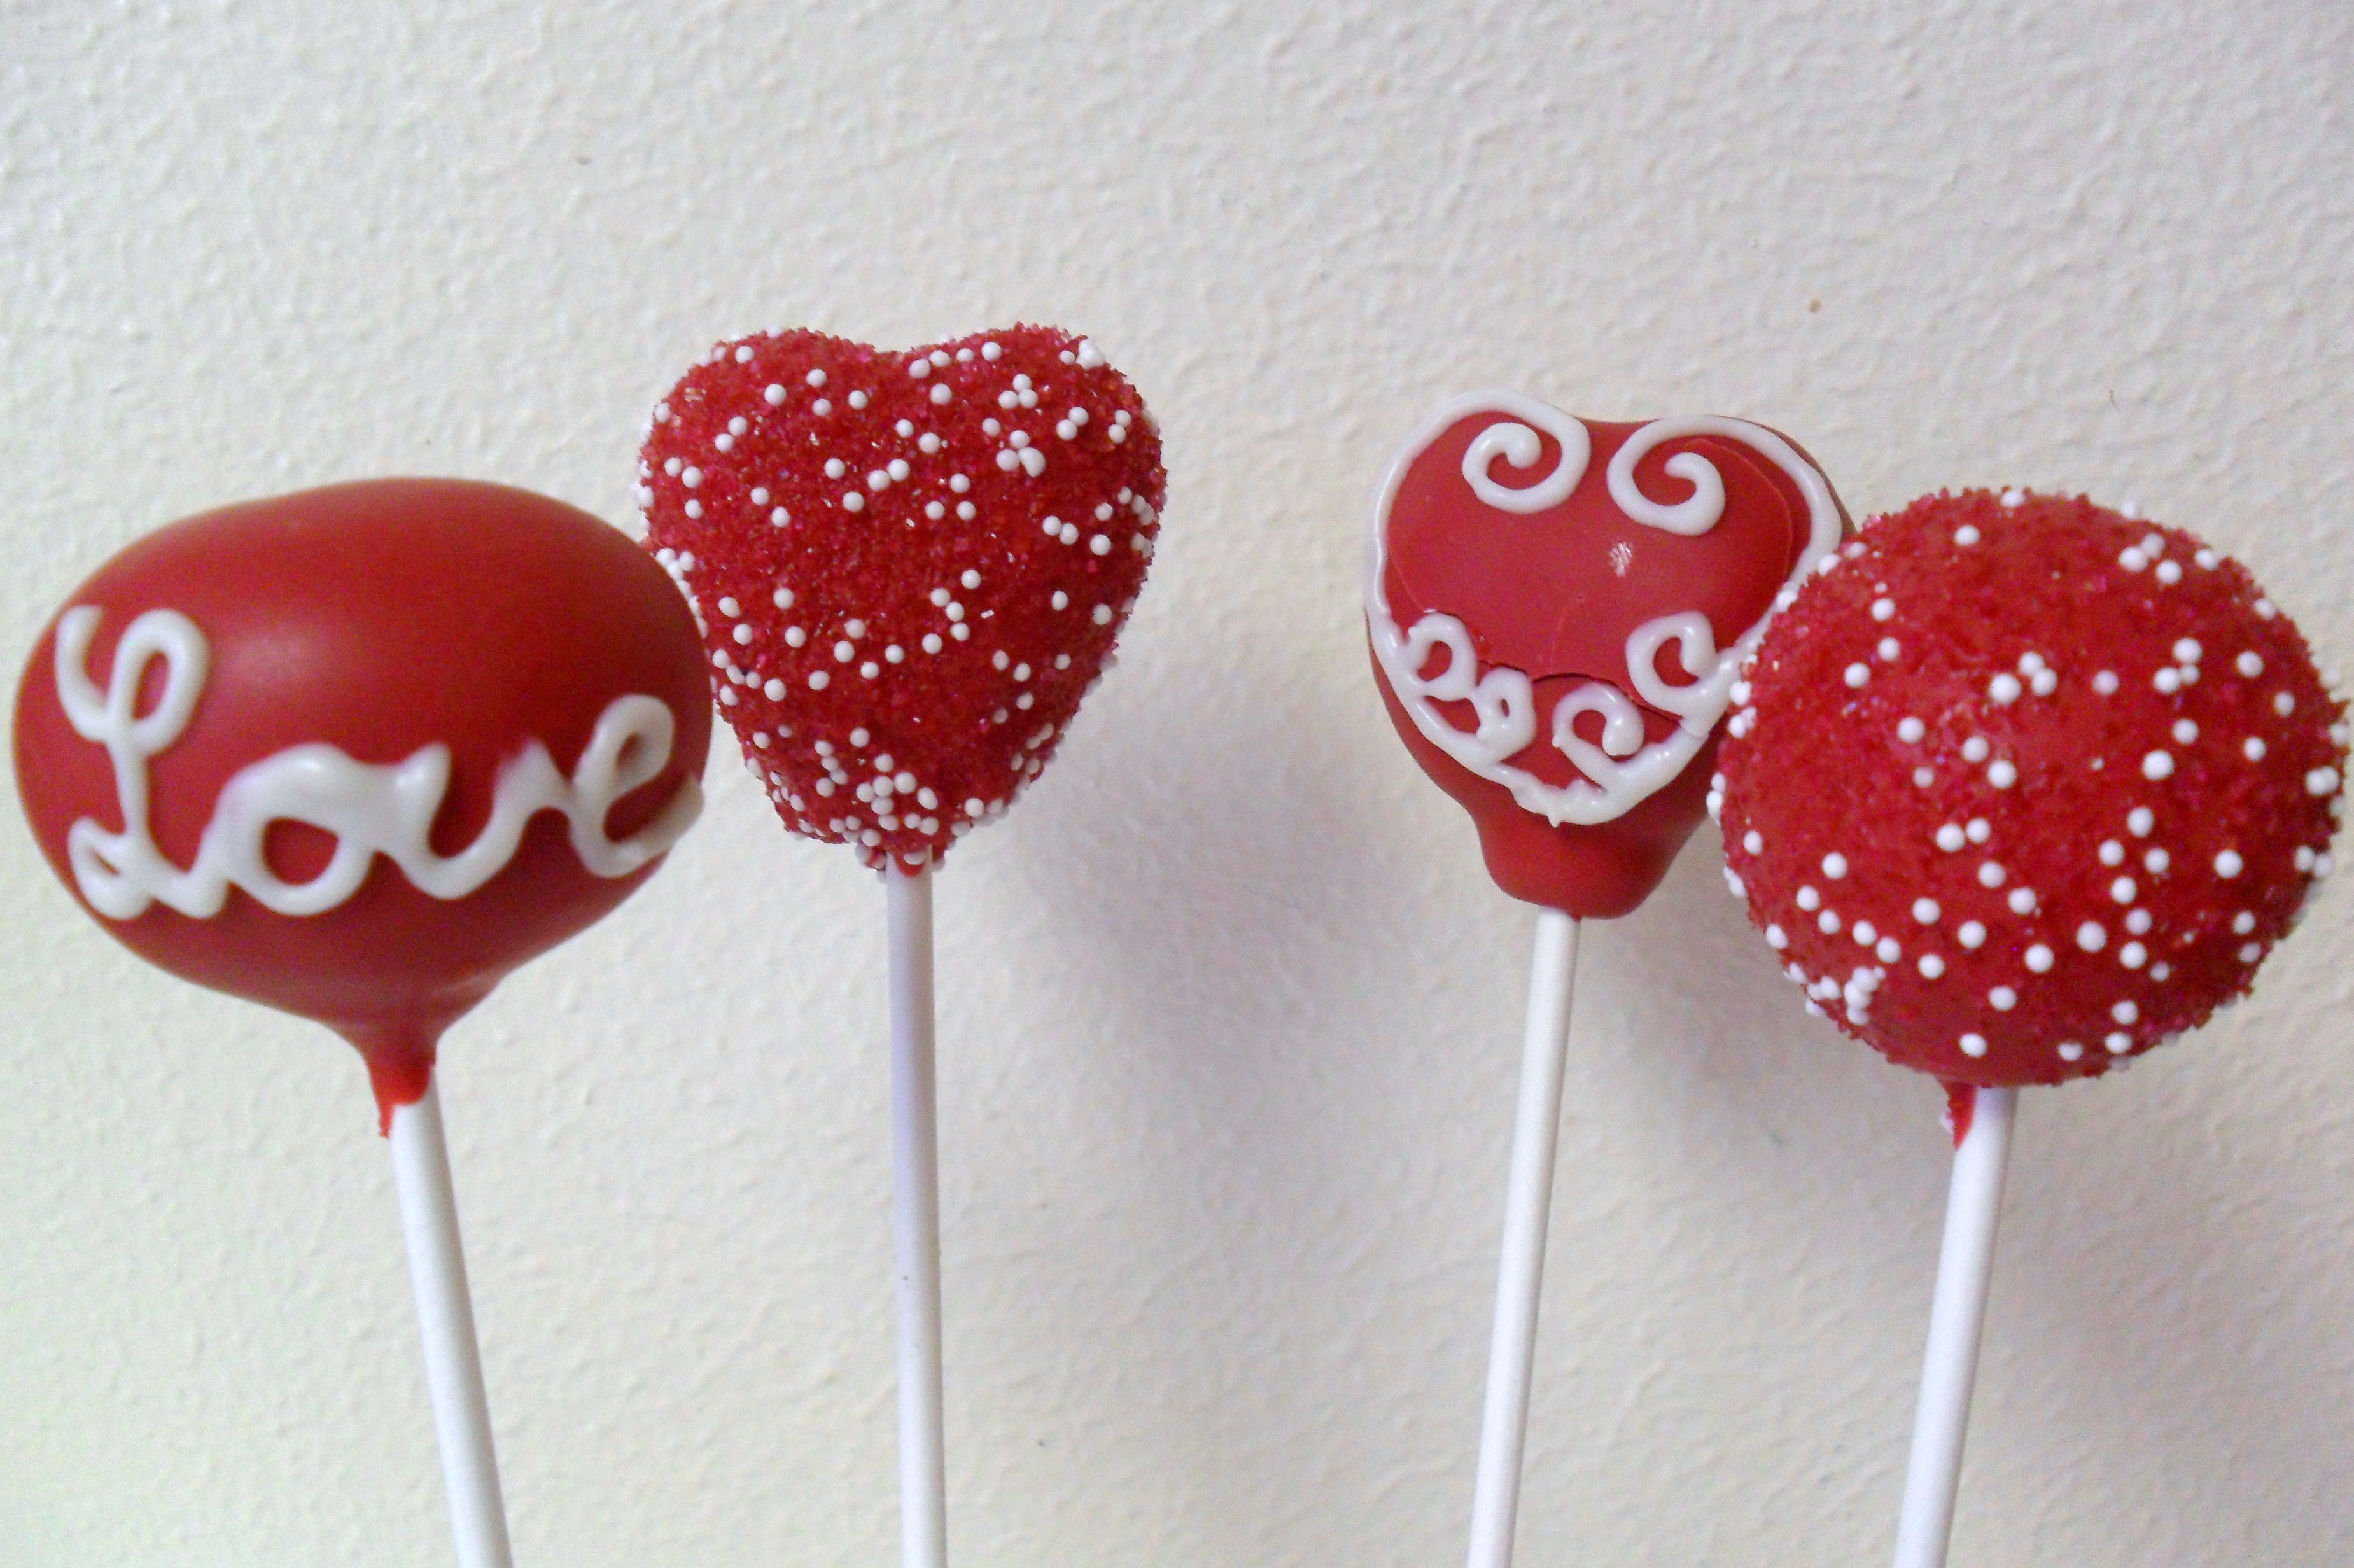 Test Kitchen Ideas For Valentine S Day Let Them Eat Pops